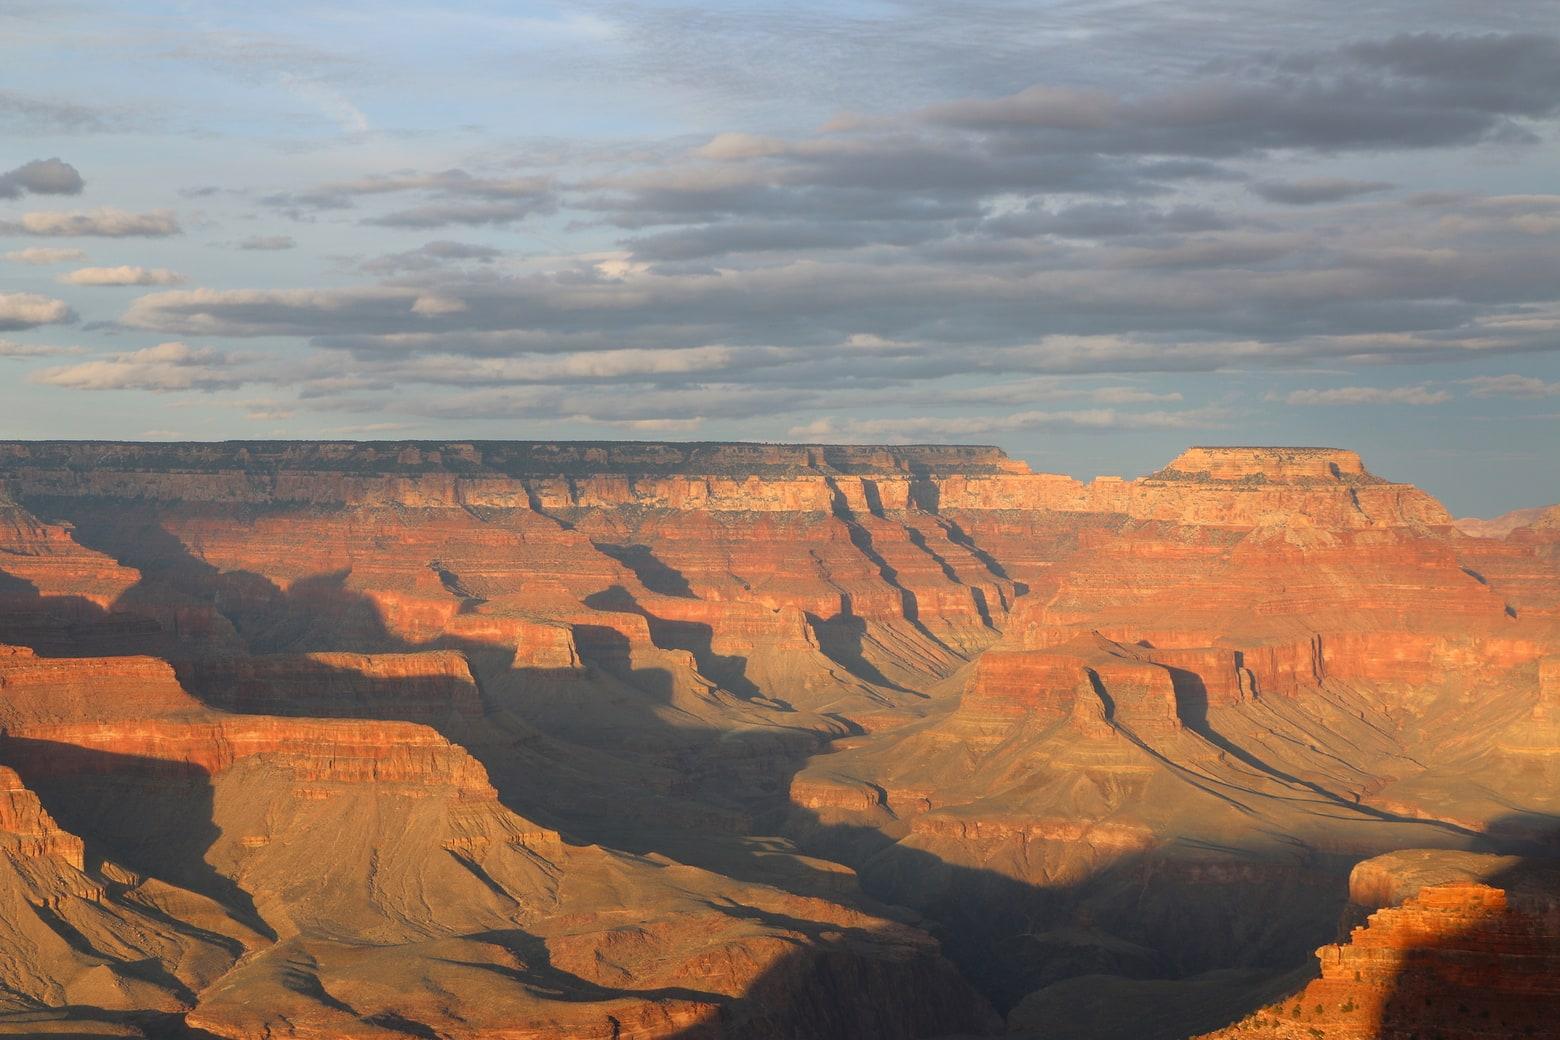 Image of sunset